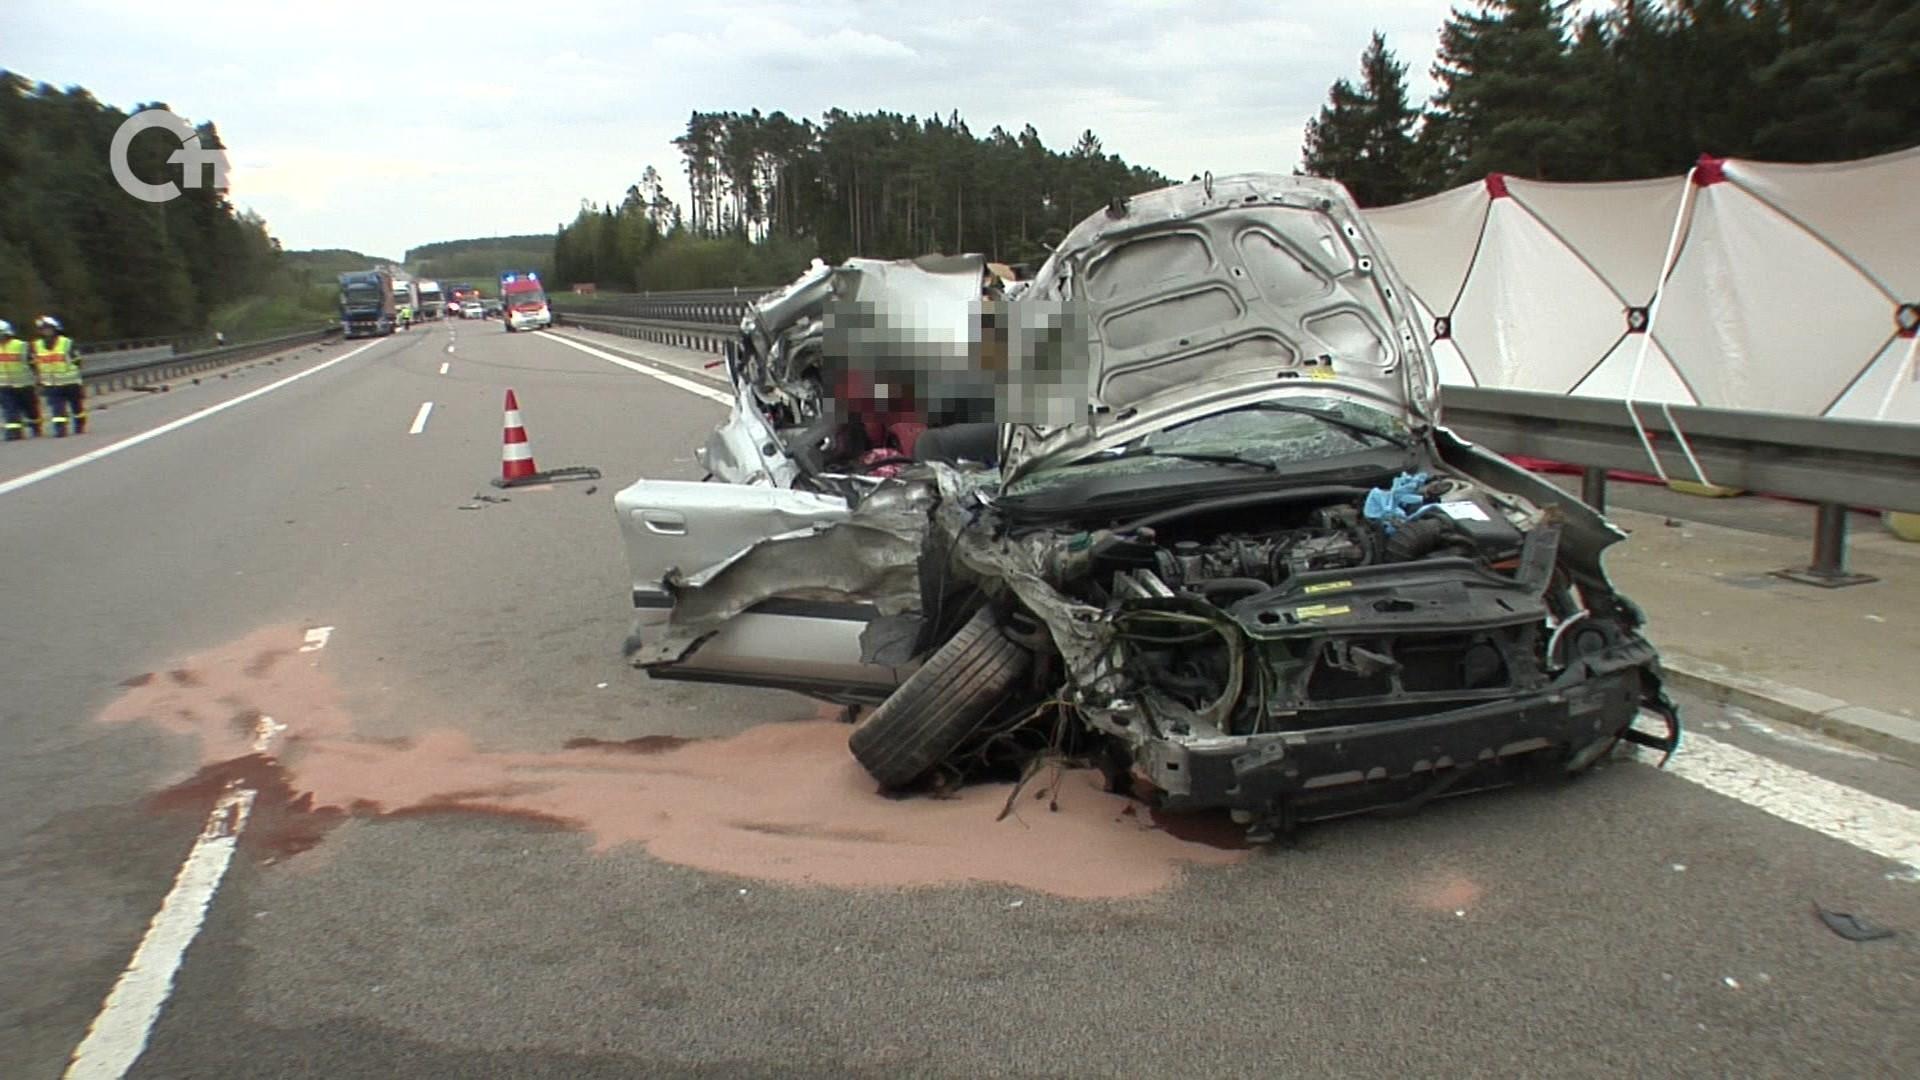 Tödlicher Verkehrsunfall auf der A6 | Oberpfalz TV